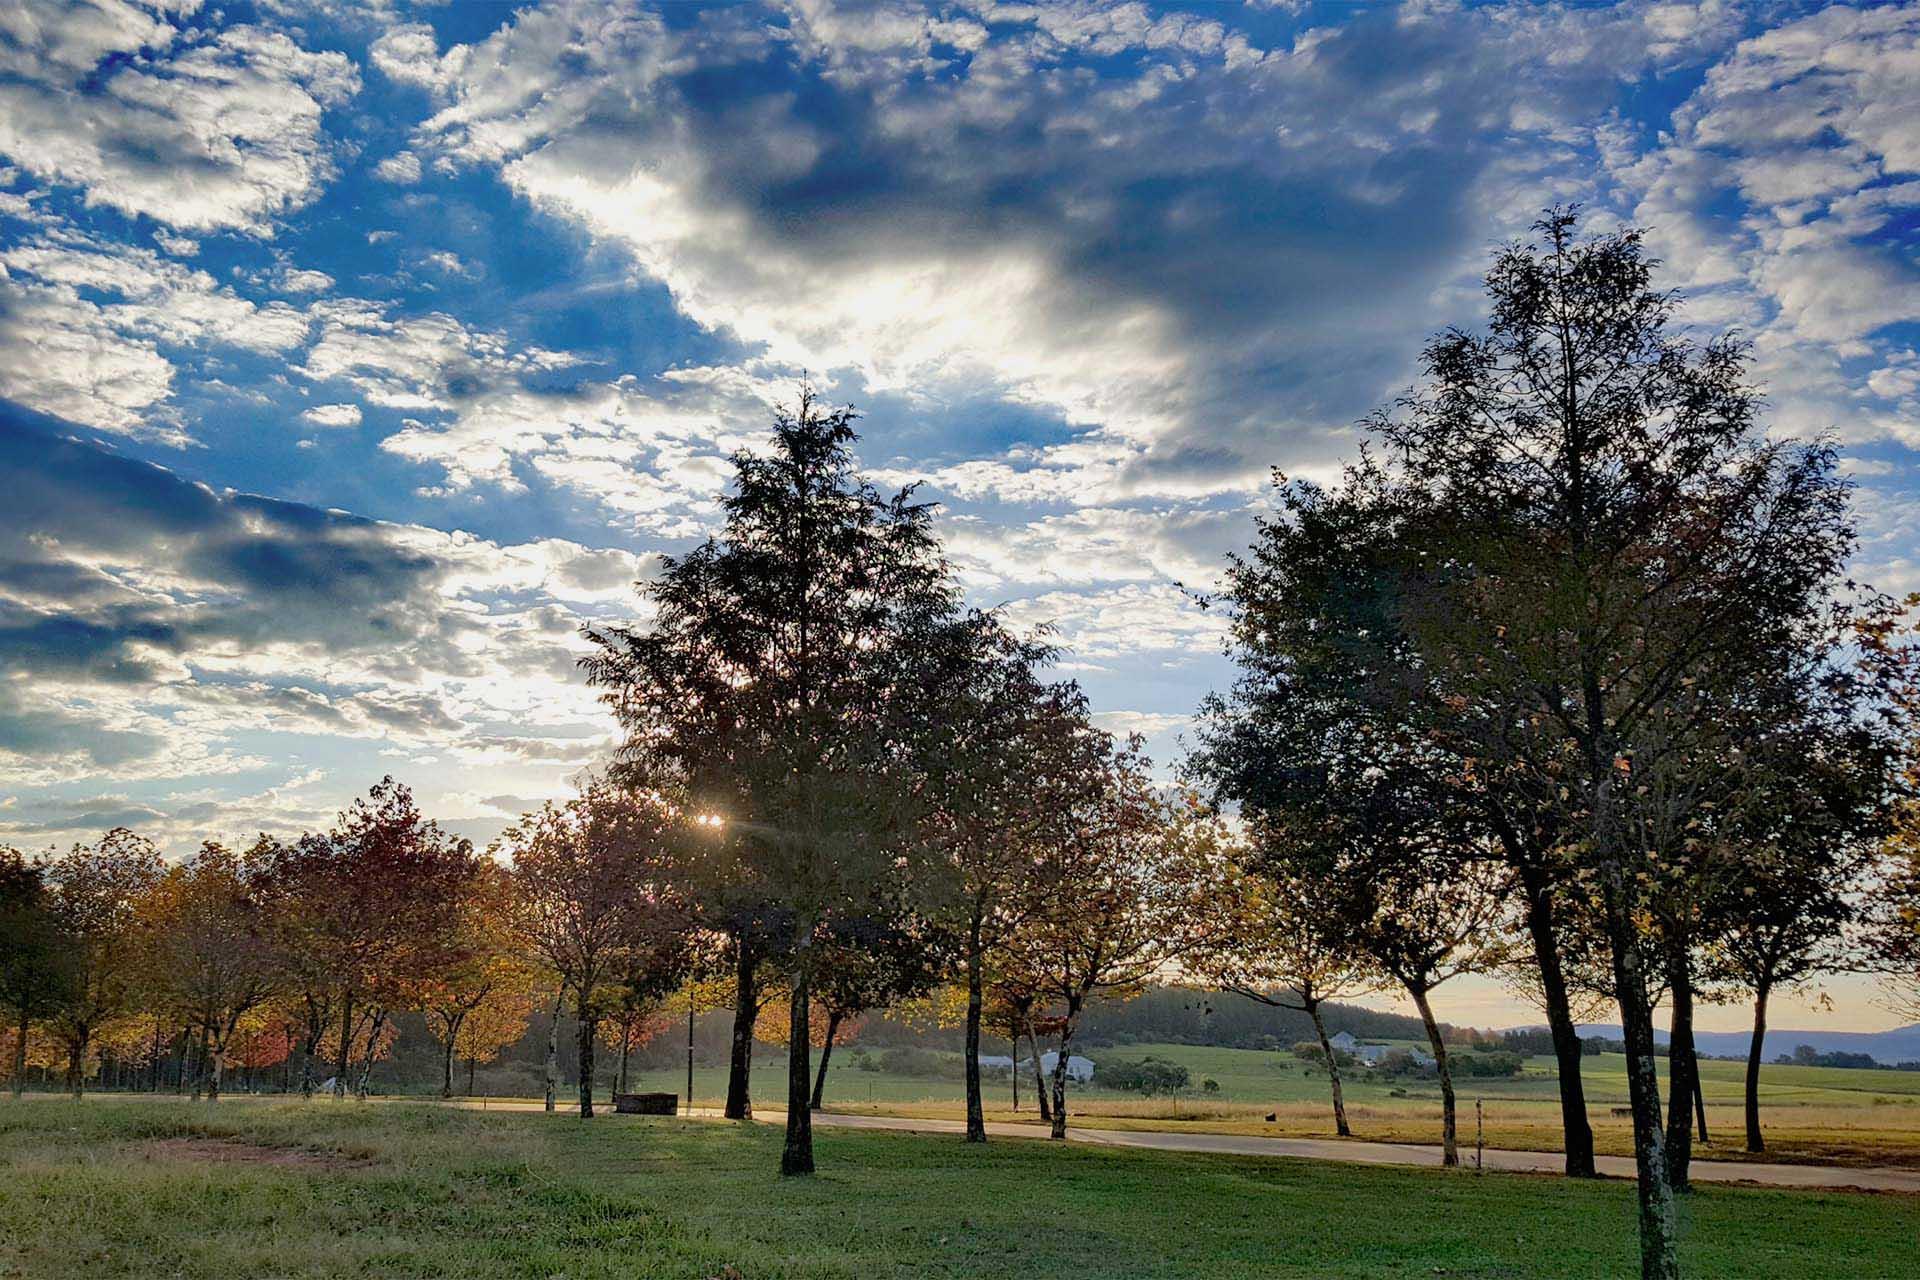 amenities-nova-spa-garlington-estate-luxury-country-development-hilton-kzn-midlands-contemporary-countryside